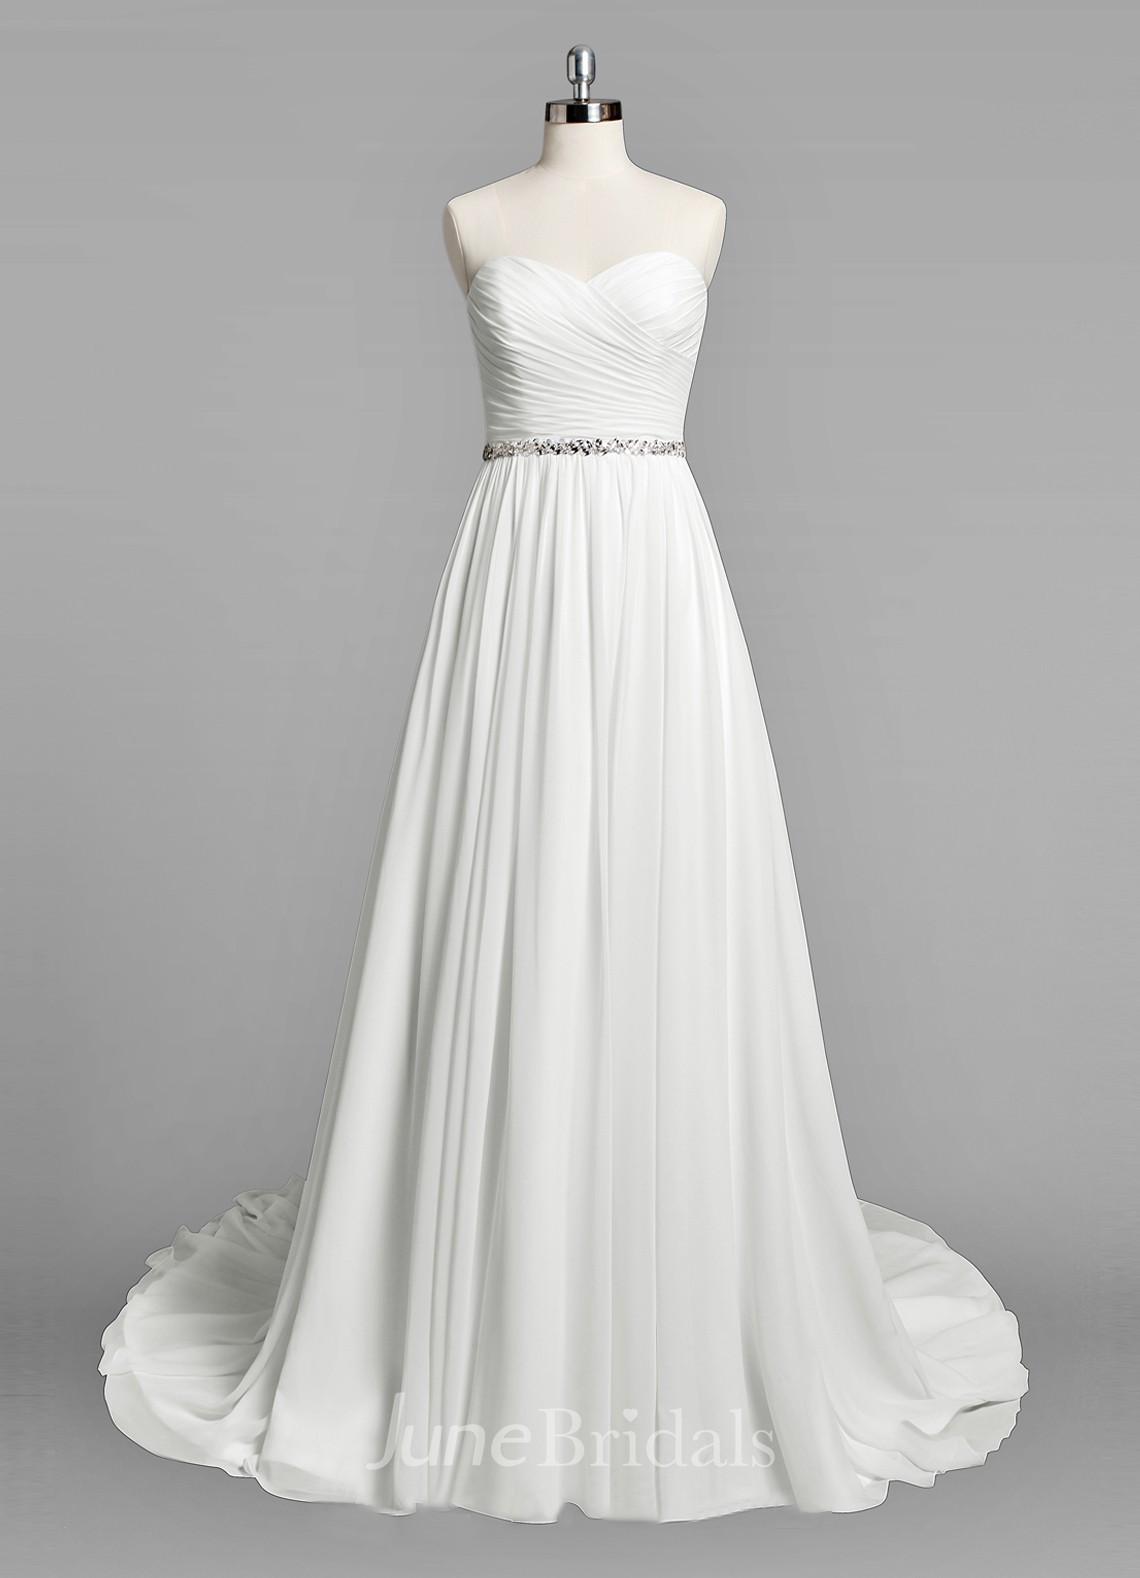 Sweetheart a line chiffon wedding dress with ruching and for A line wedding dress with ruching